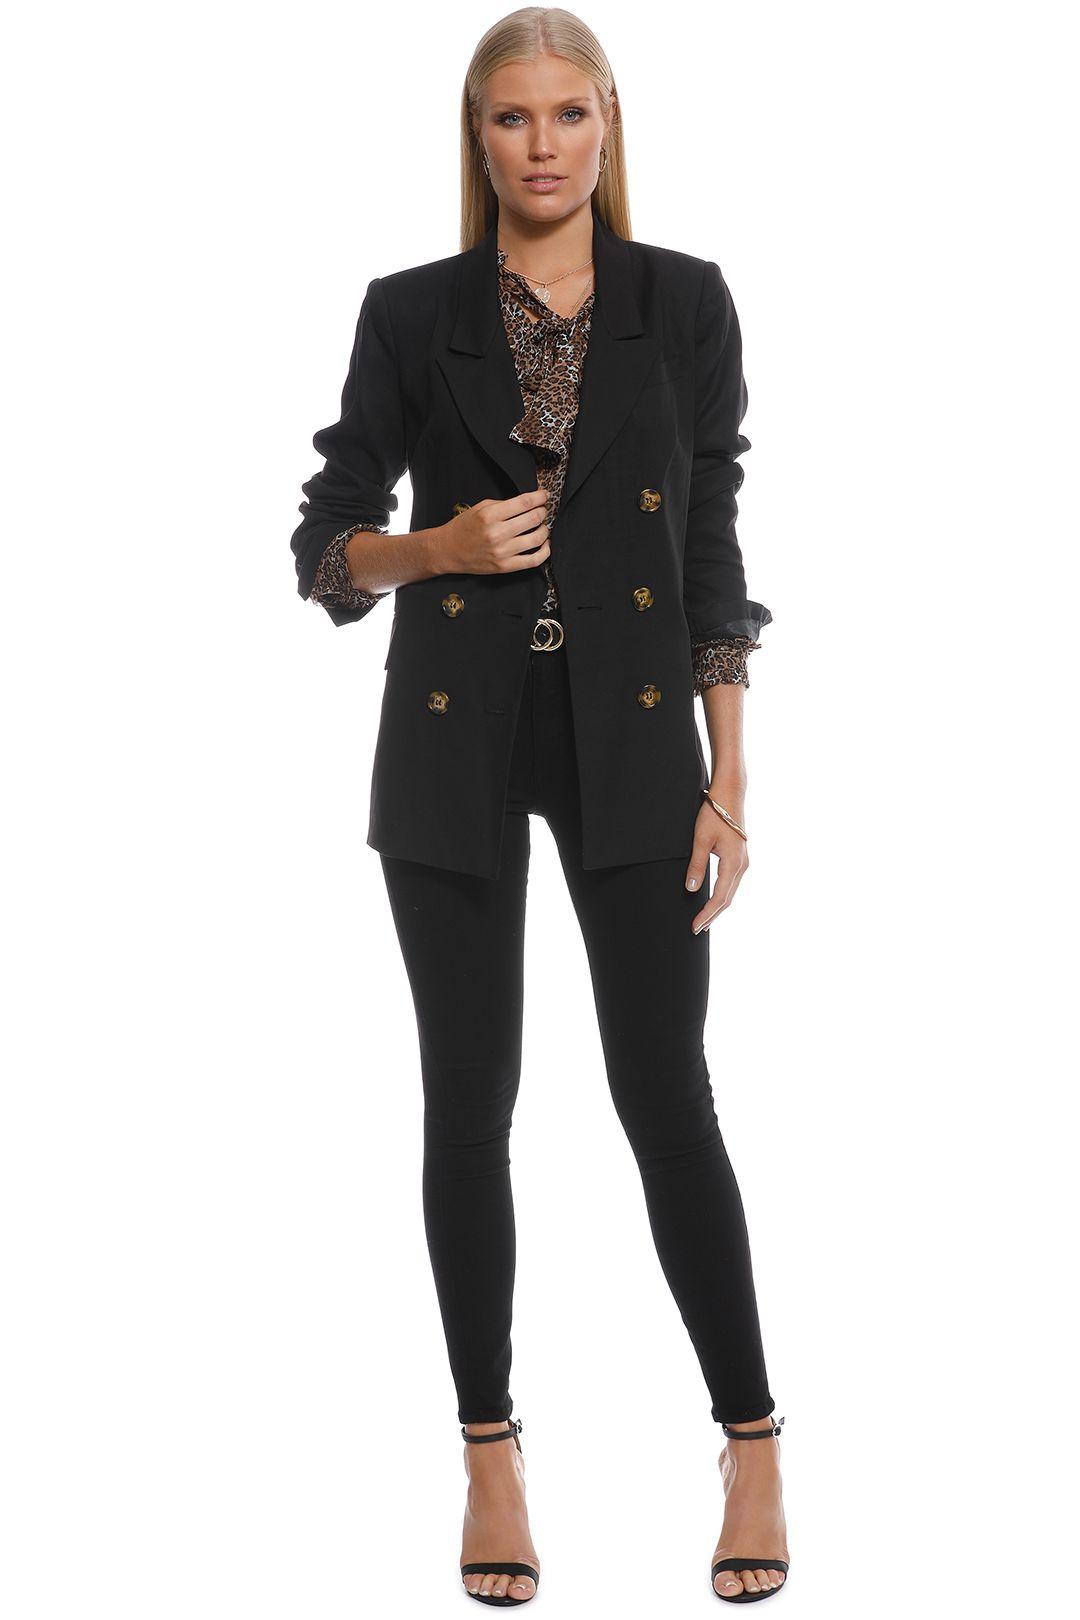 Oxford - Sienna DB Jacket - Black - Front